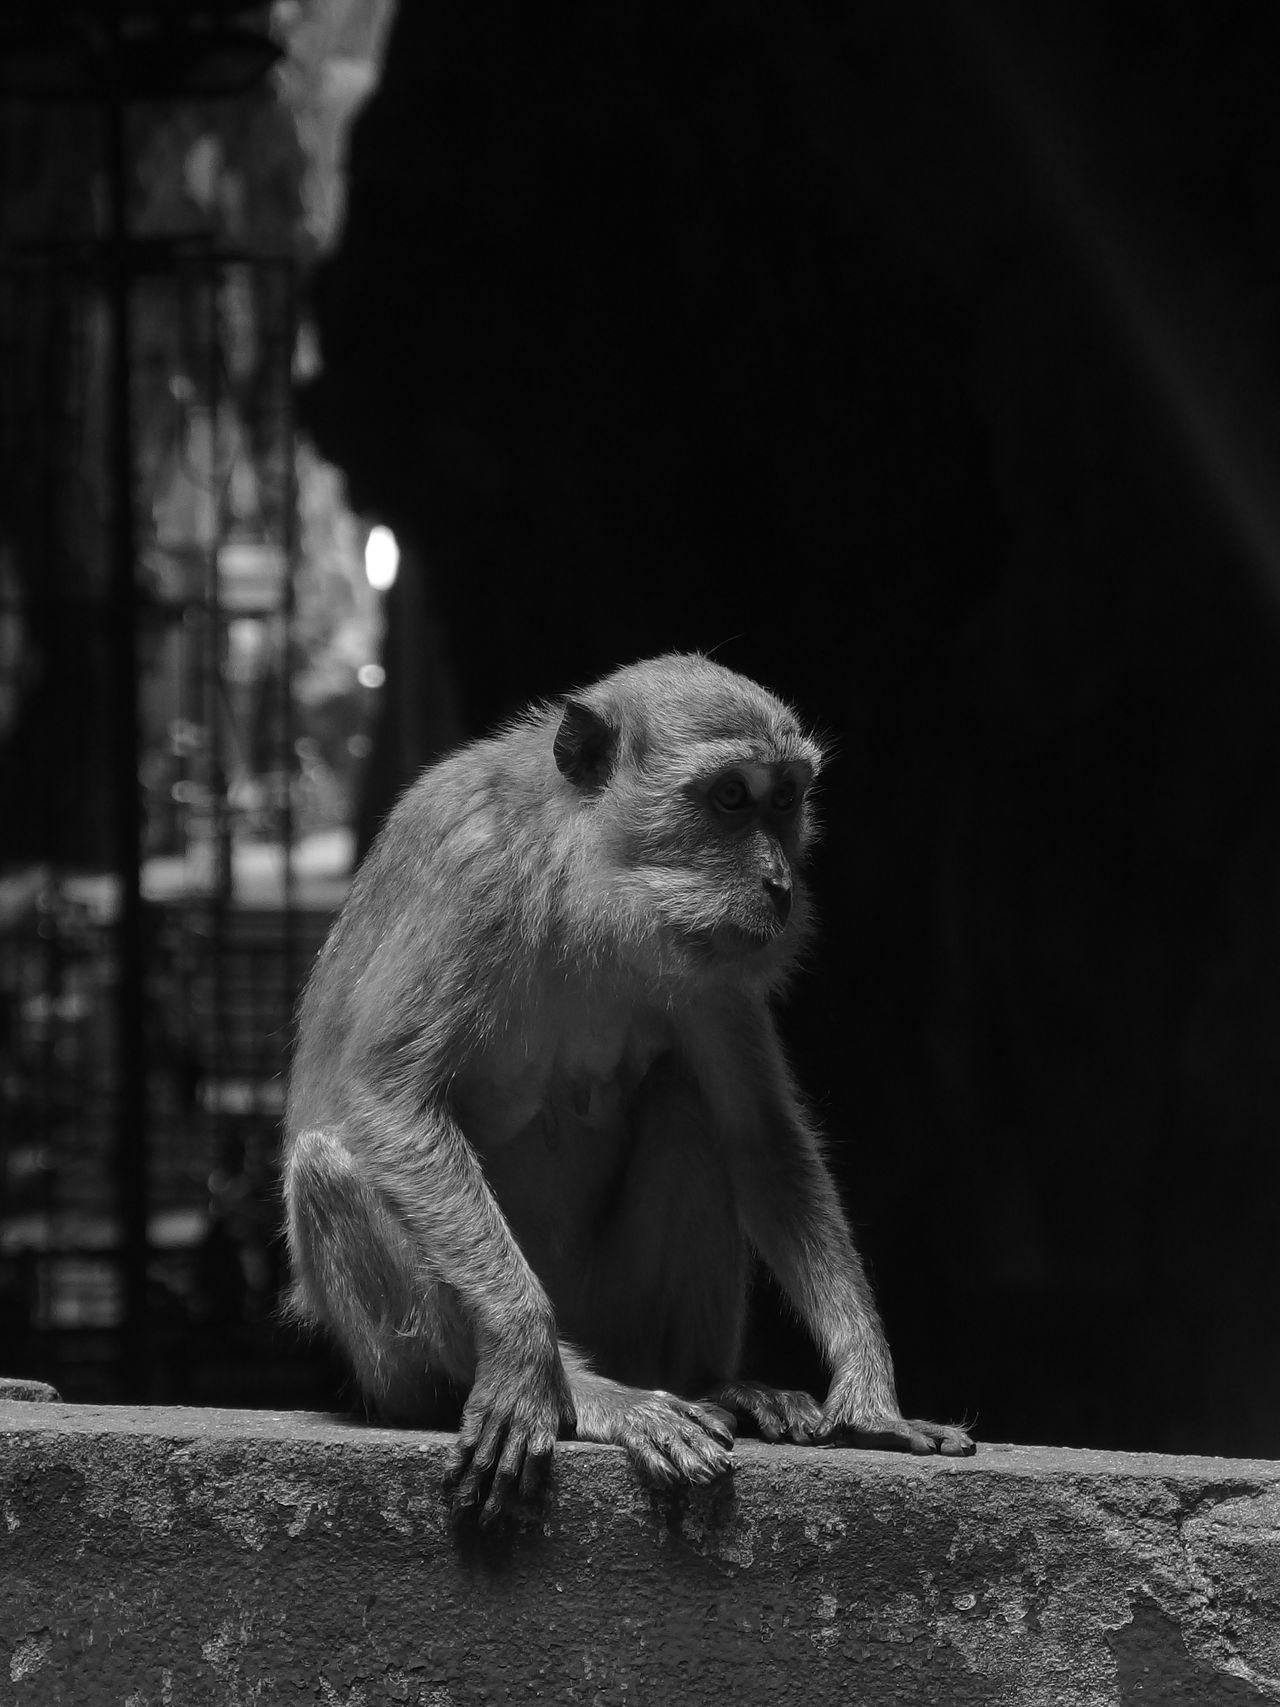 Animal Themes Batu Caves Batu Caves -Malaysia Black And White Cave Monkey No People Old One Animal Silence